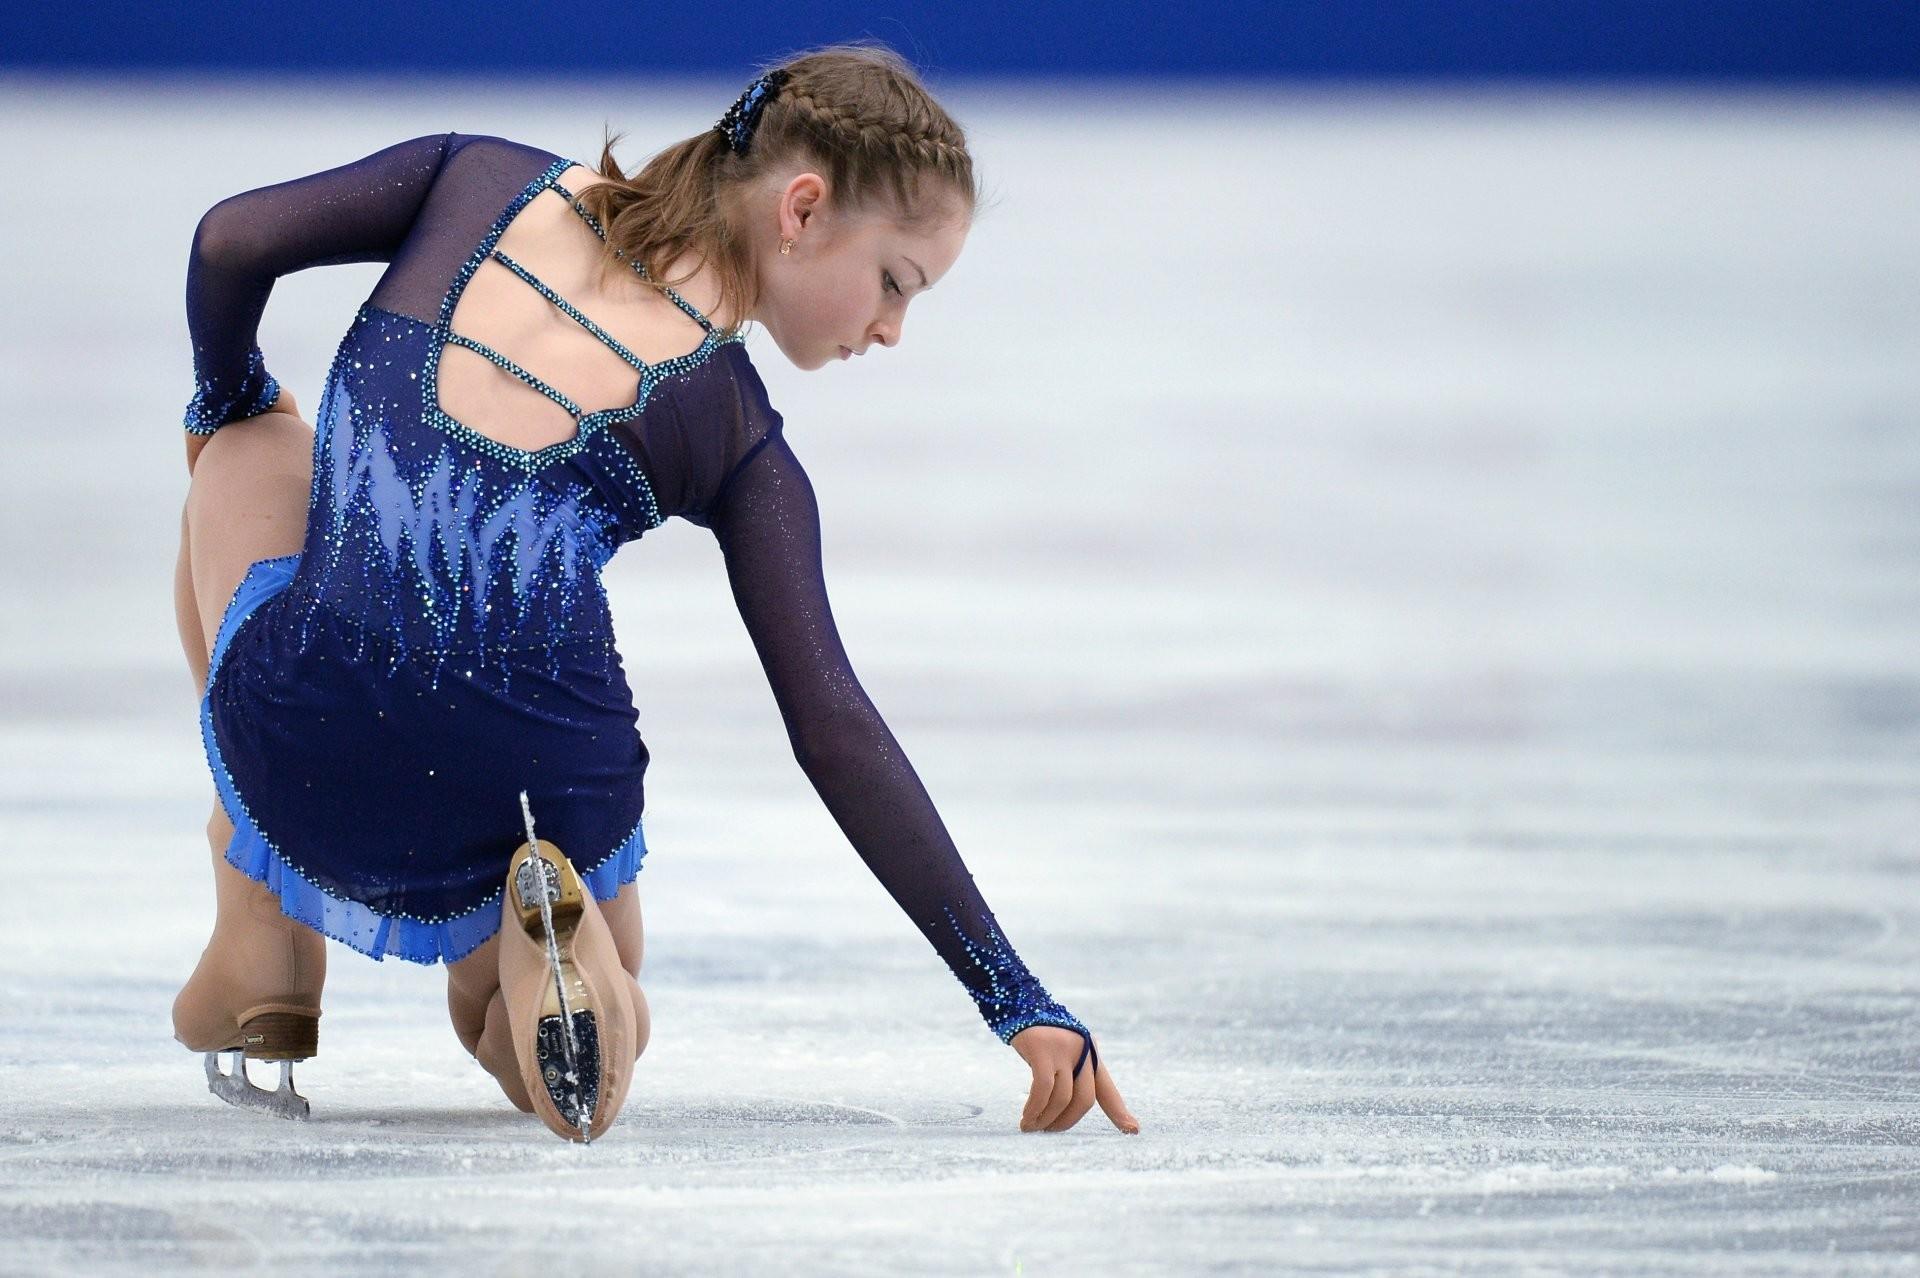 Res: 1920x1278, julia lipnitskaya skater figure skating